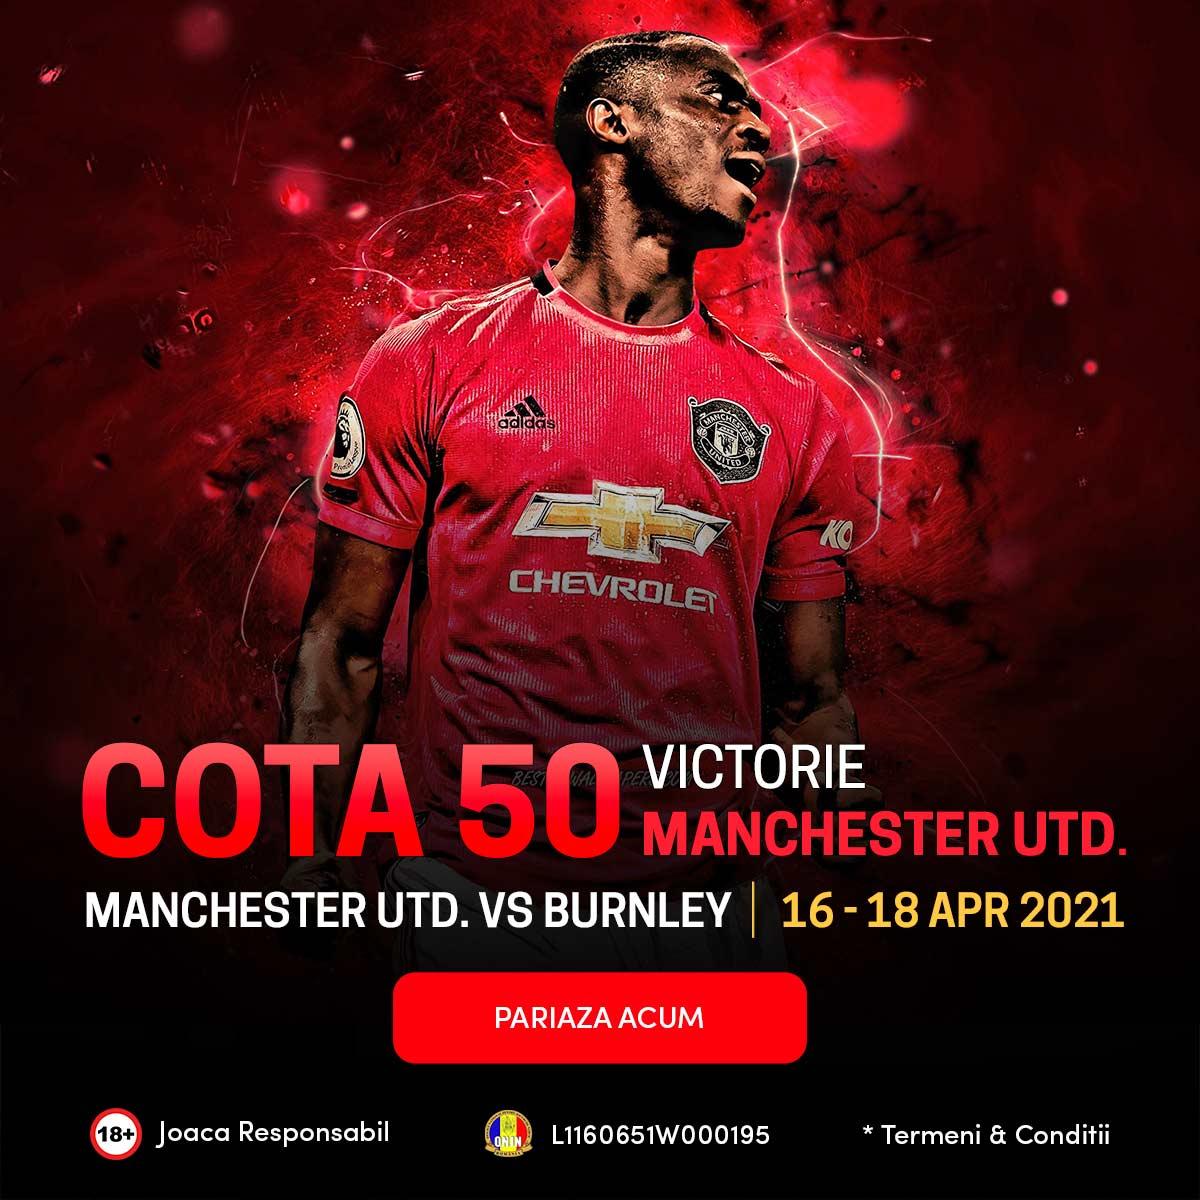 banner cota 50 manchester united